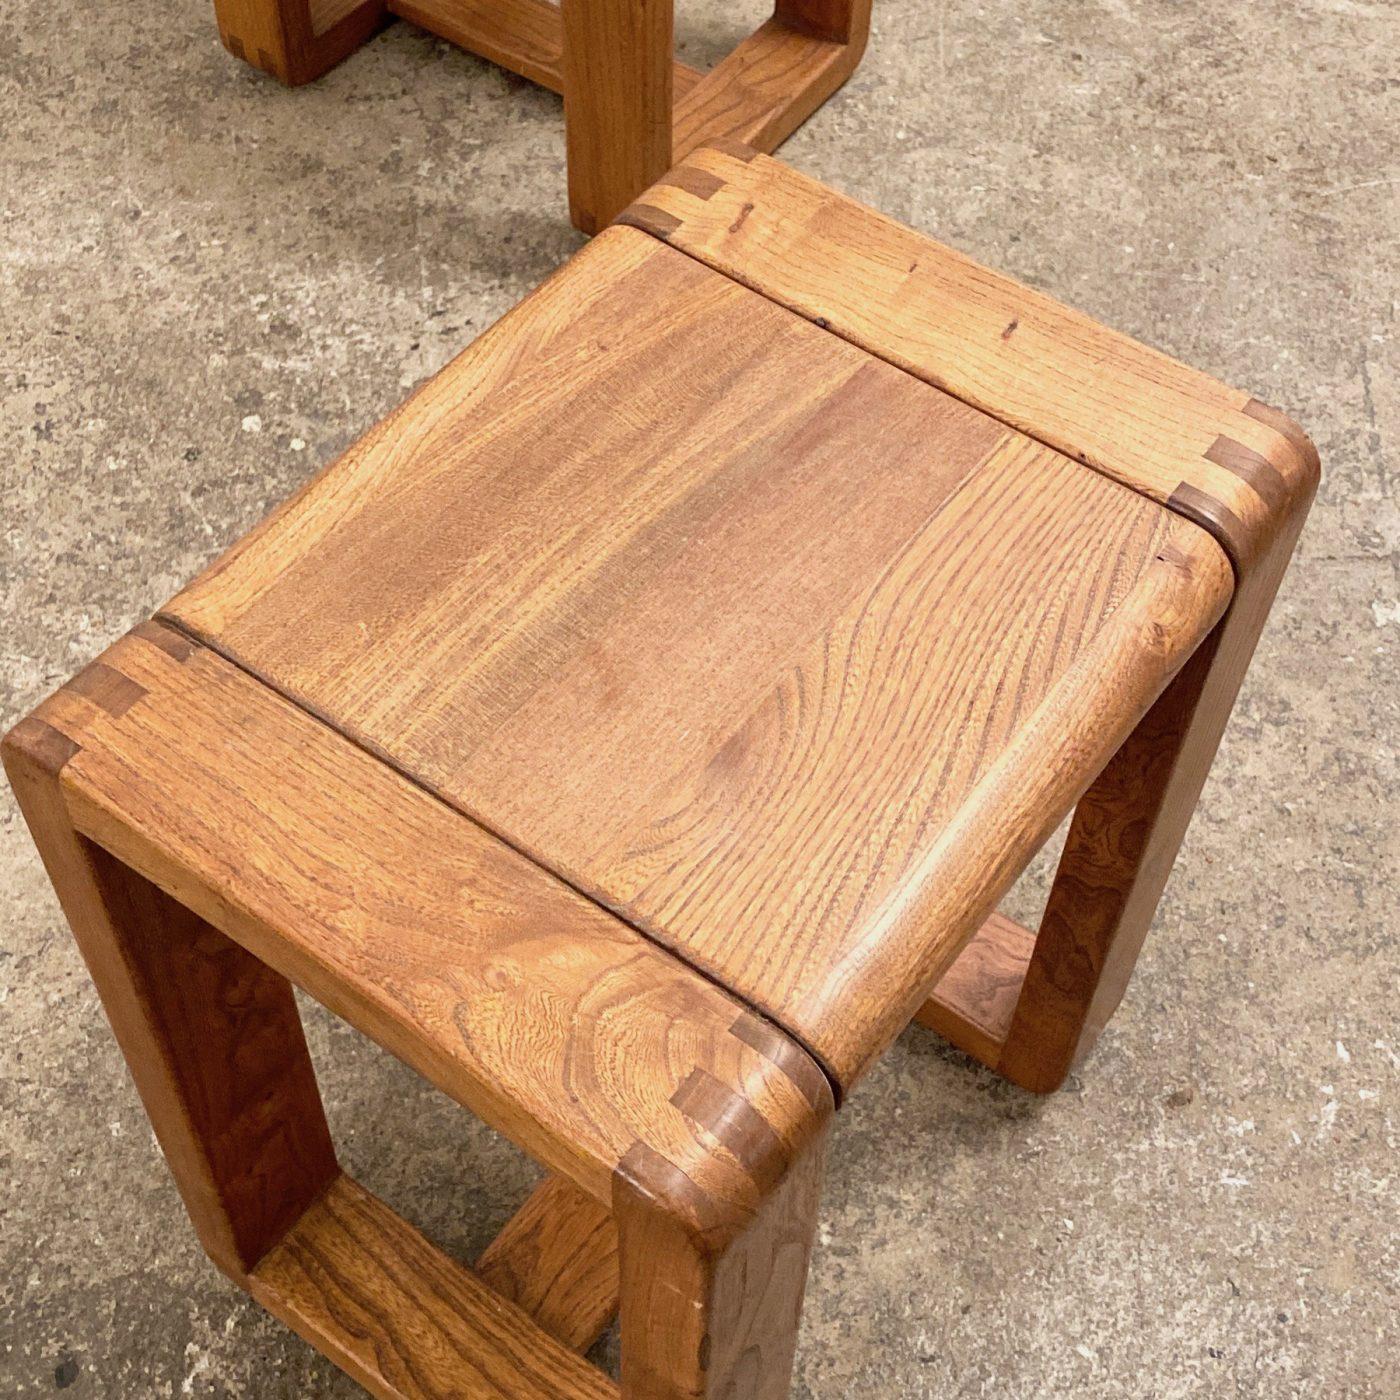 objet-vagabond-massive-stools0008